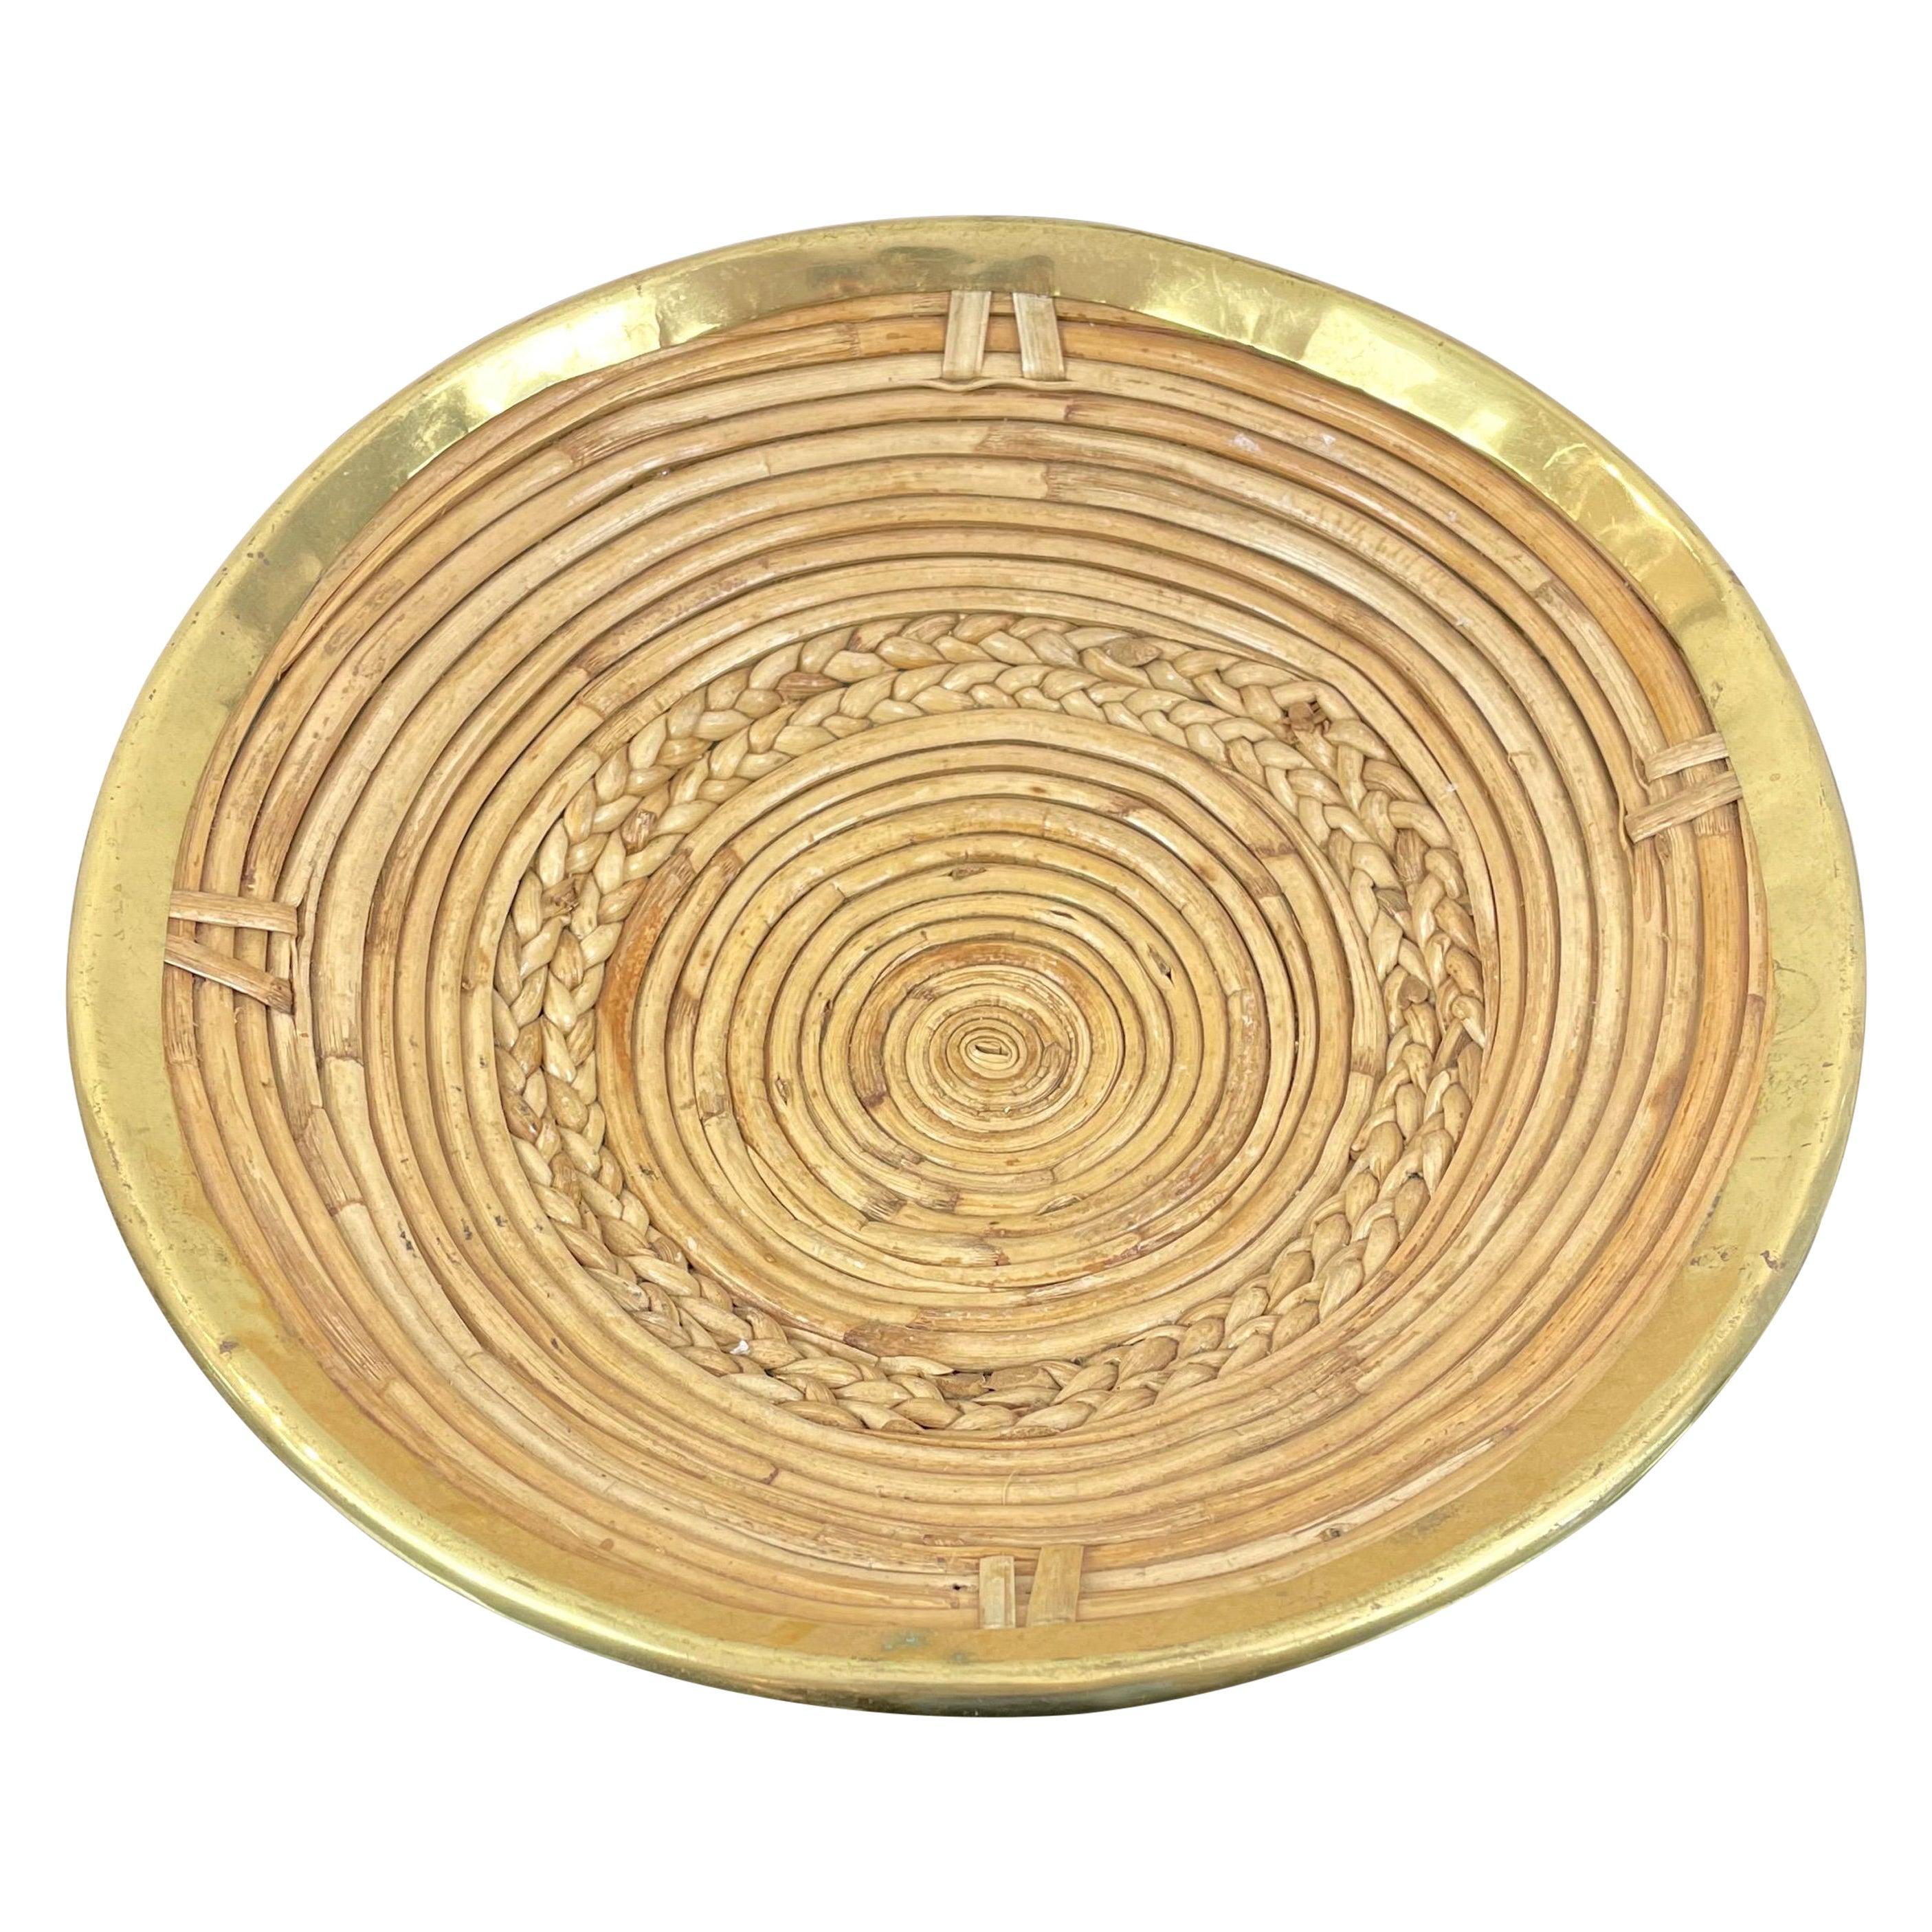 Round Rattan & Brass Plate Centerpiece, Italy, 1970s